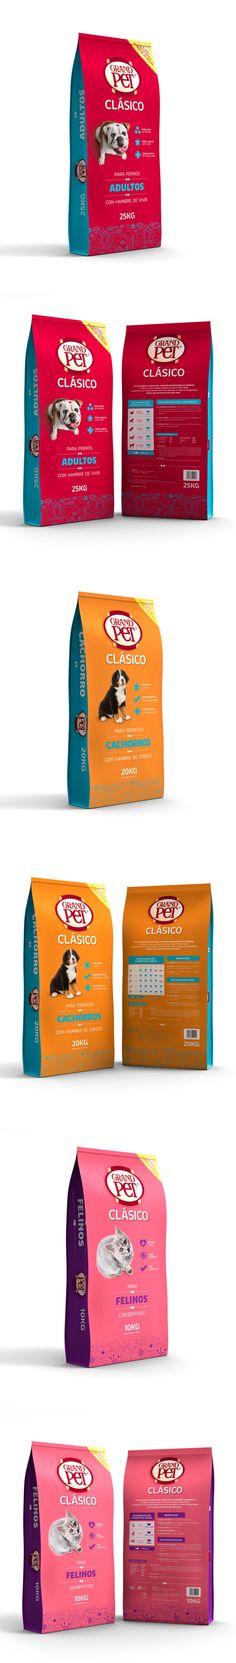 GRANDPET CLÁSICO® by Estudio Menta#pet #food #packaging for more information visit us at www.coffeebags.co.za